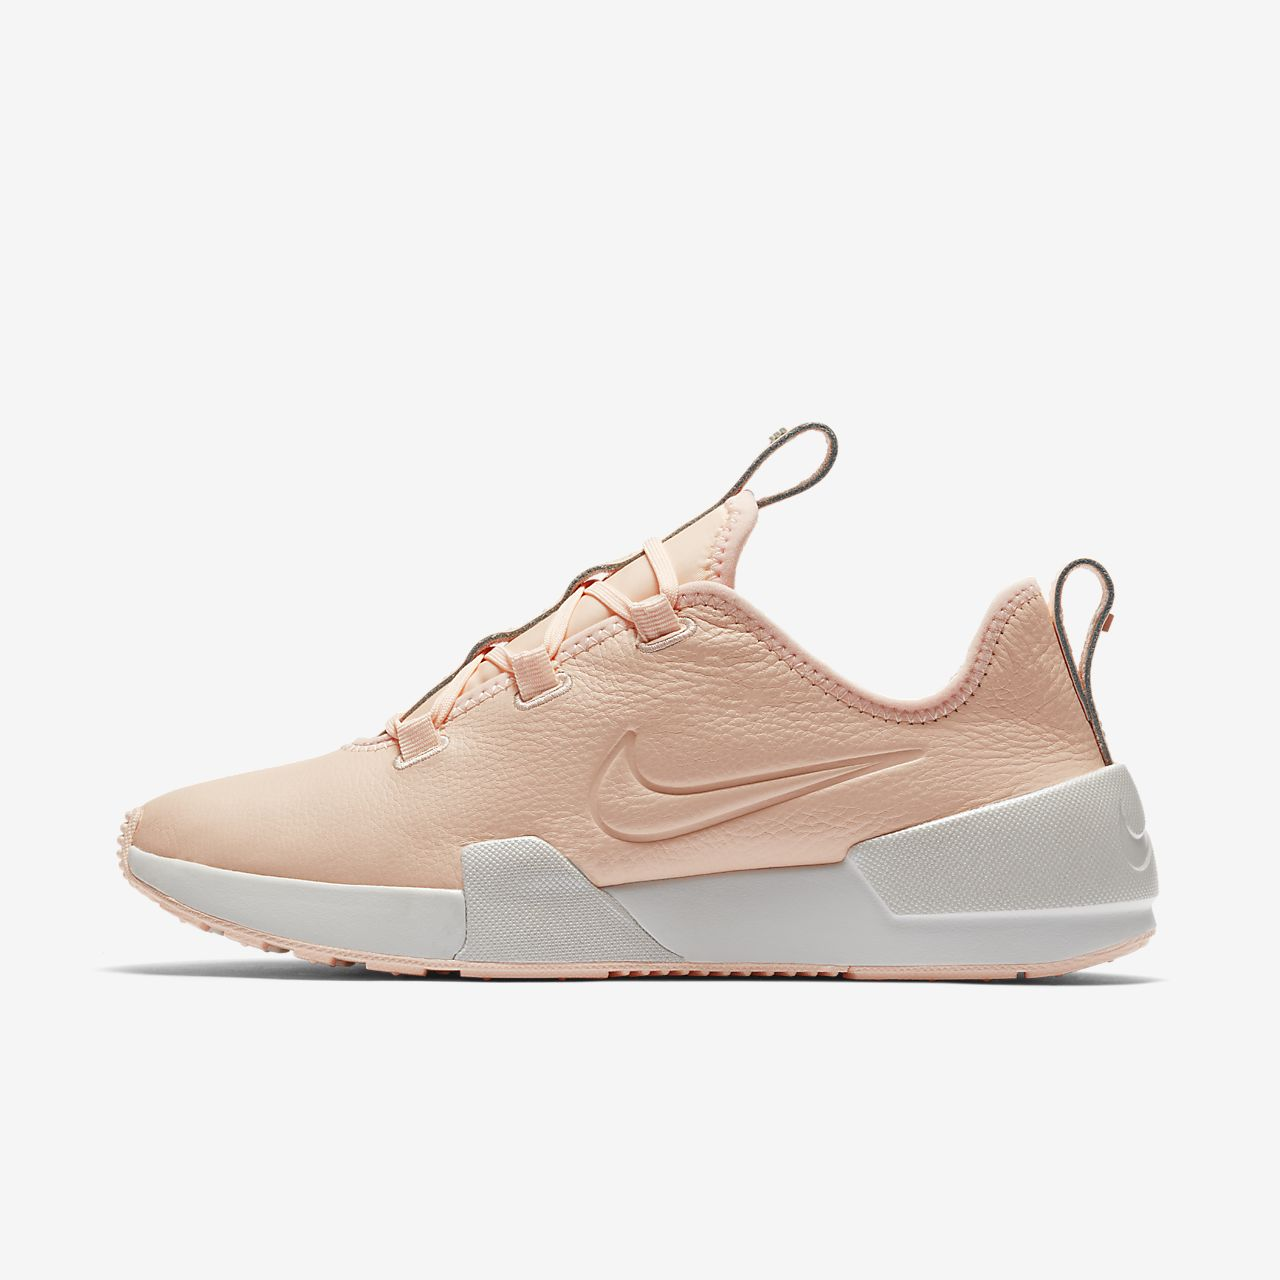 Ashin Modern Nike Footaction Zum Verkauf flAePBY - lubricate ... 4630e749a8